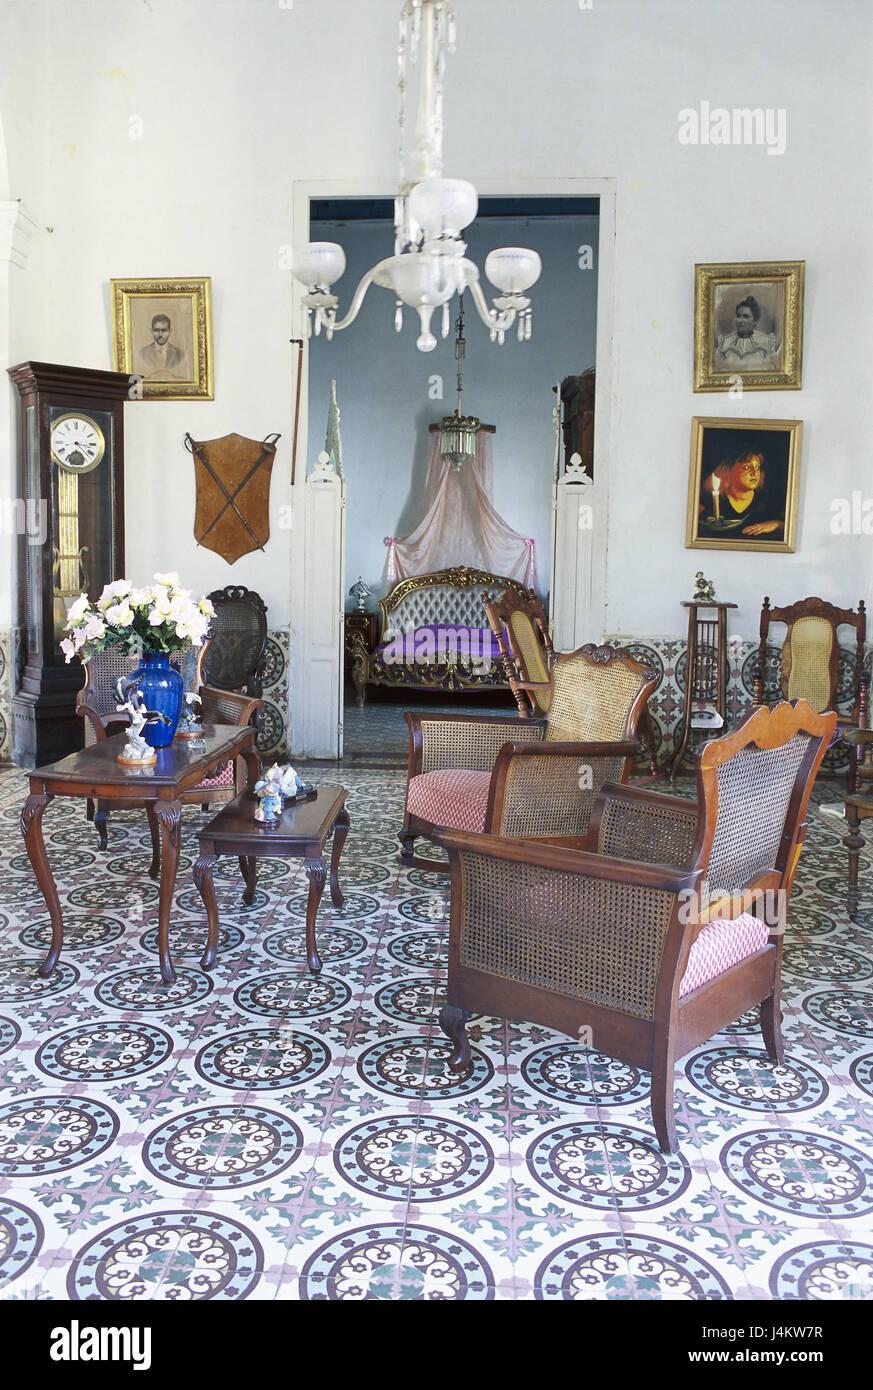 Trinidad, Kuba, Wohnfläche, Haus im Kolonialstil der Karibik ...